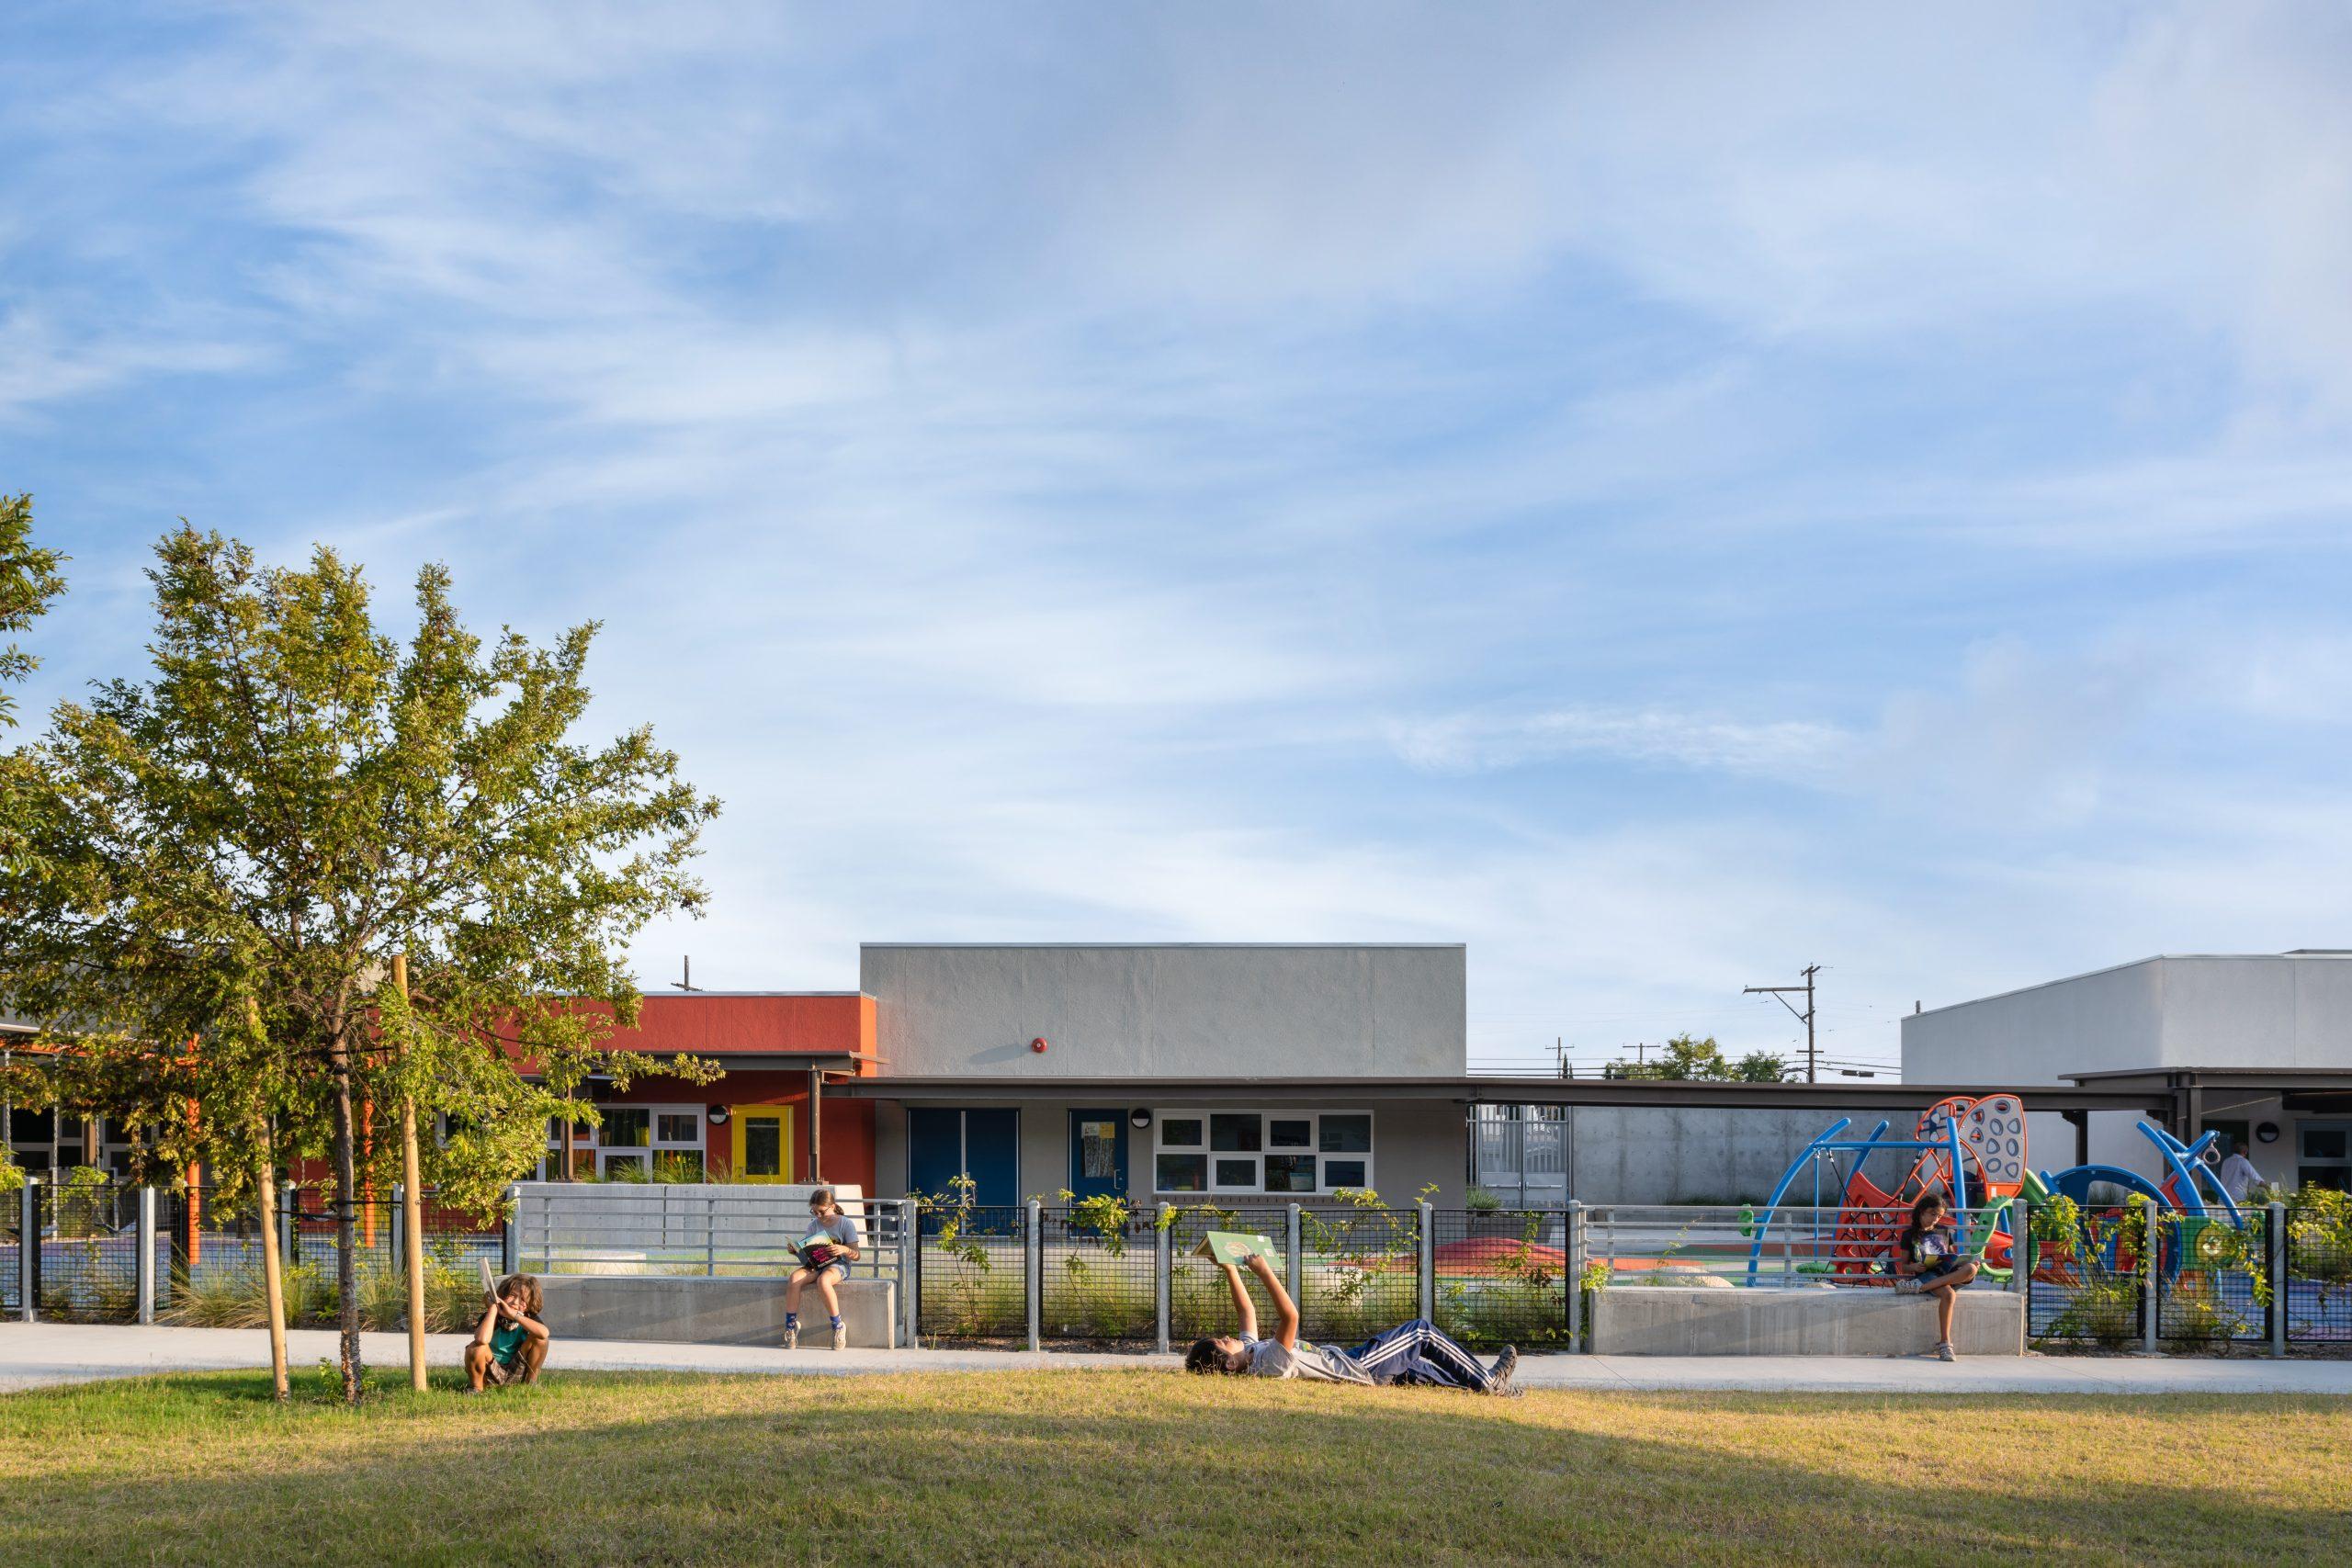 Adams Elementary / San Diego Global Visions Academy